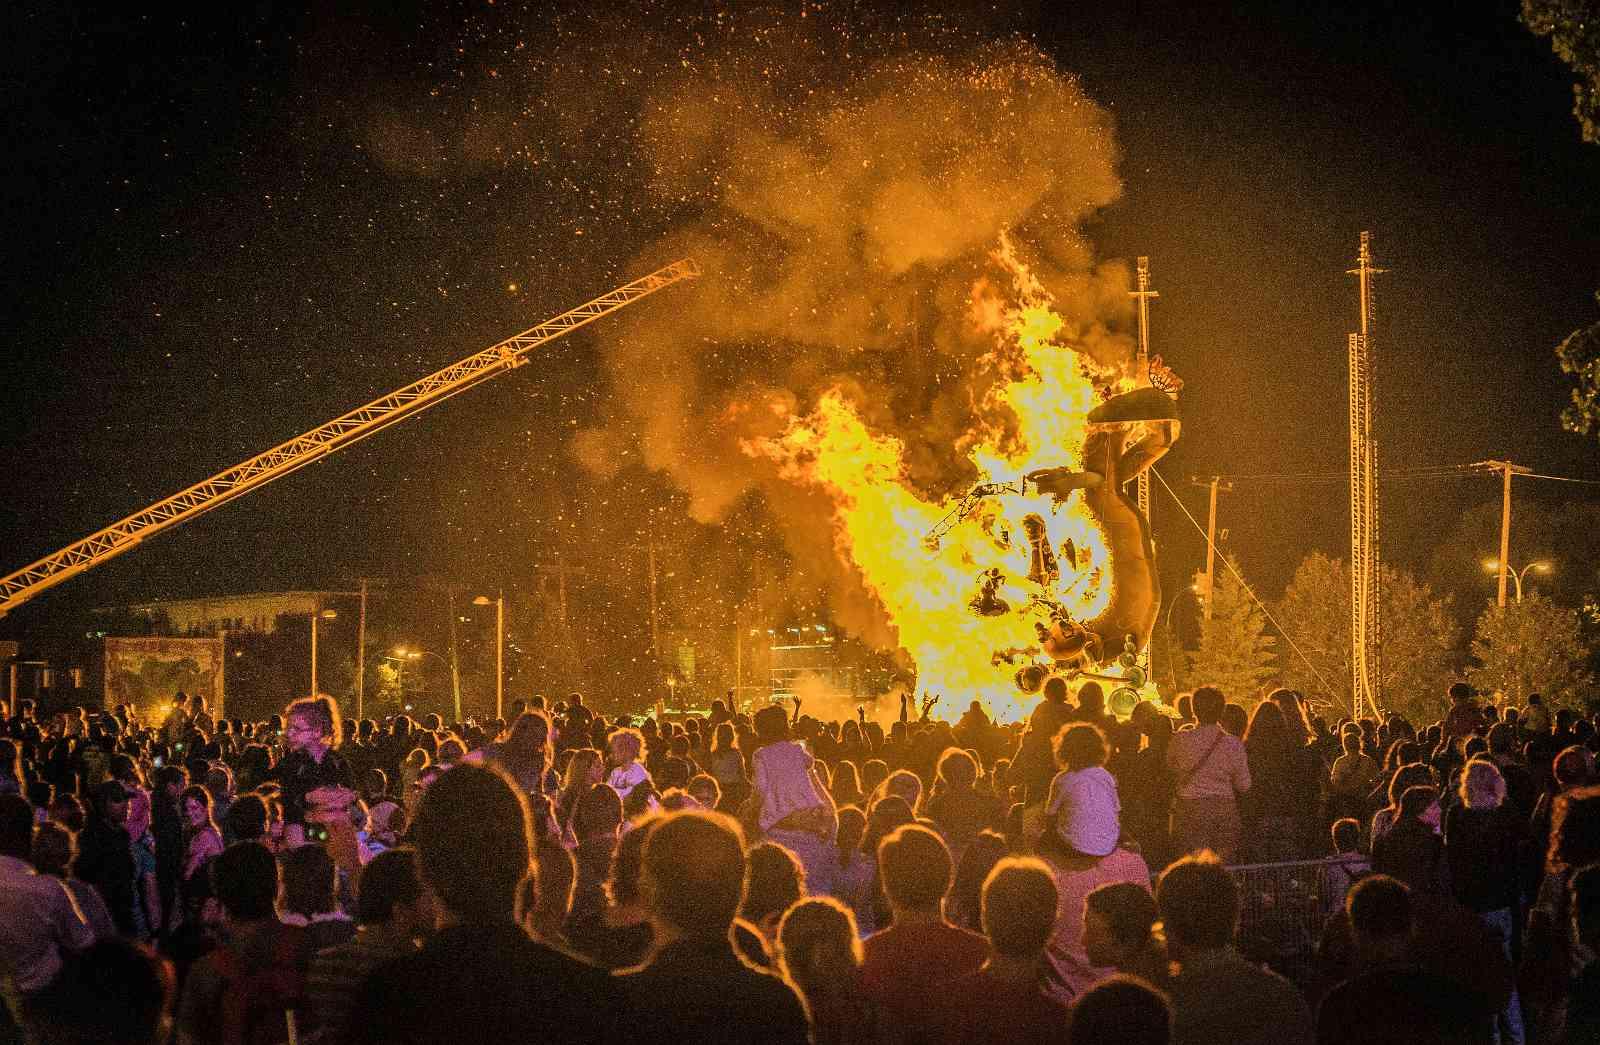 Montreal festivals in August 2016 include FALLA.